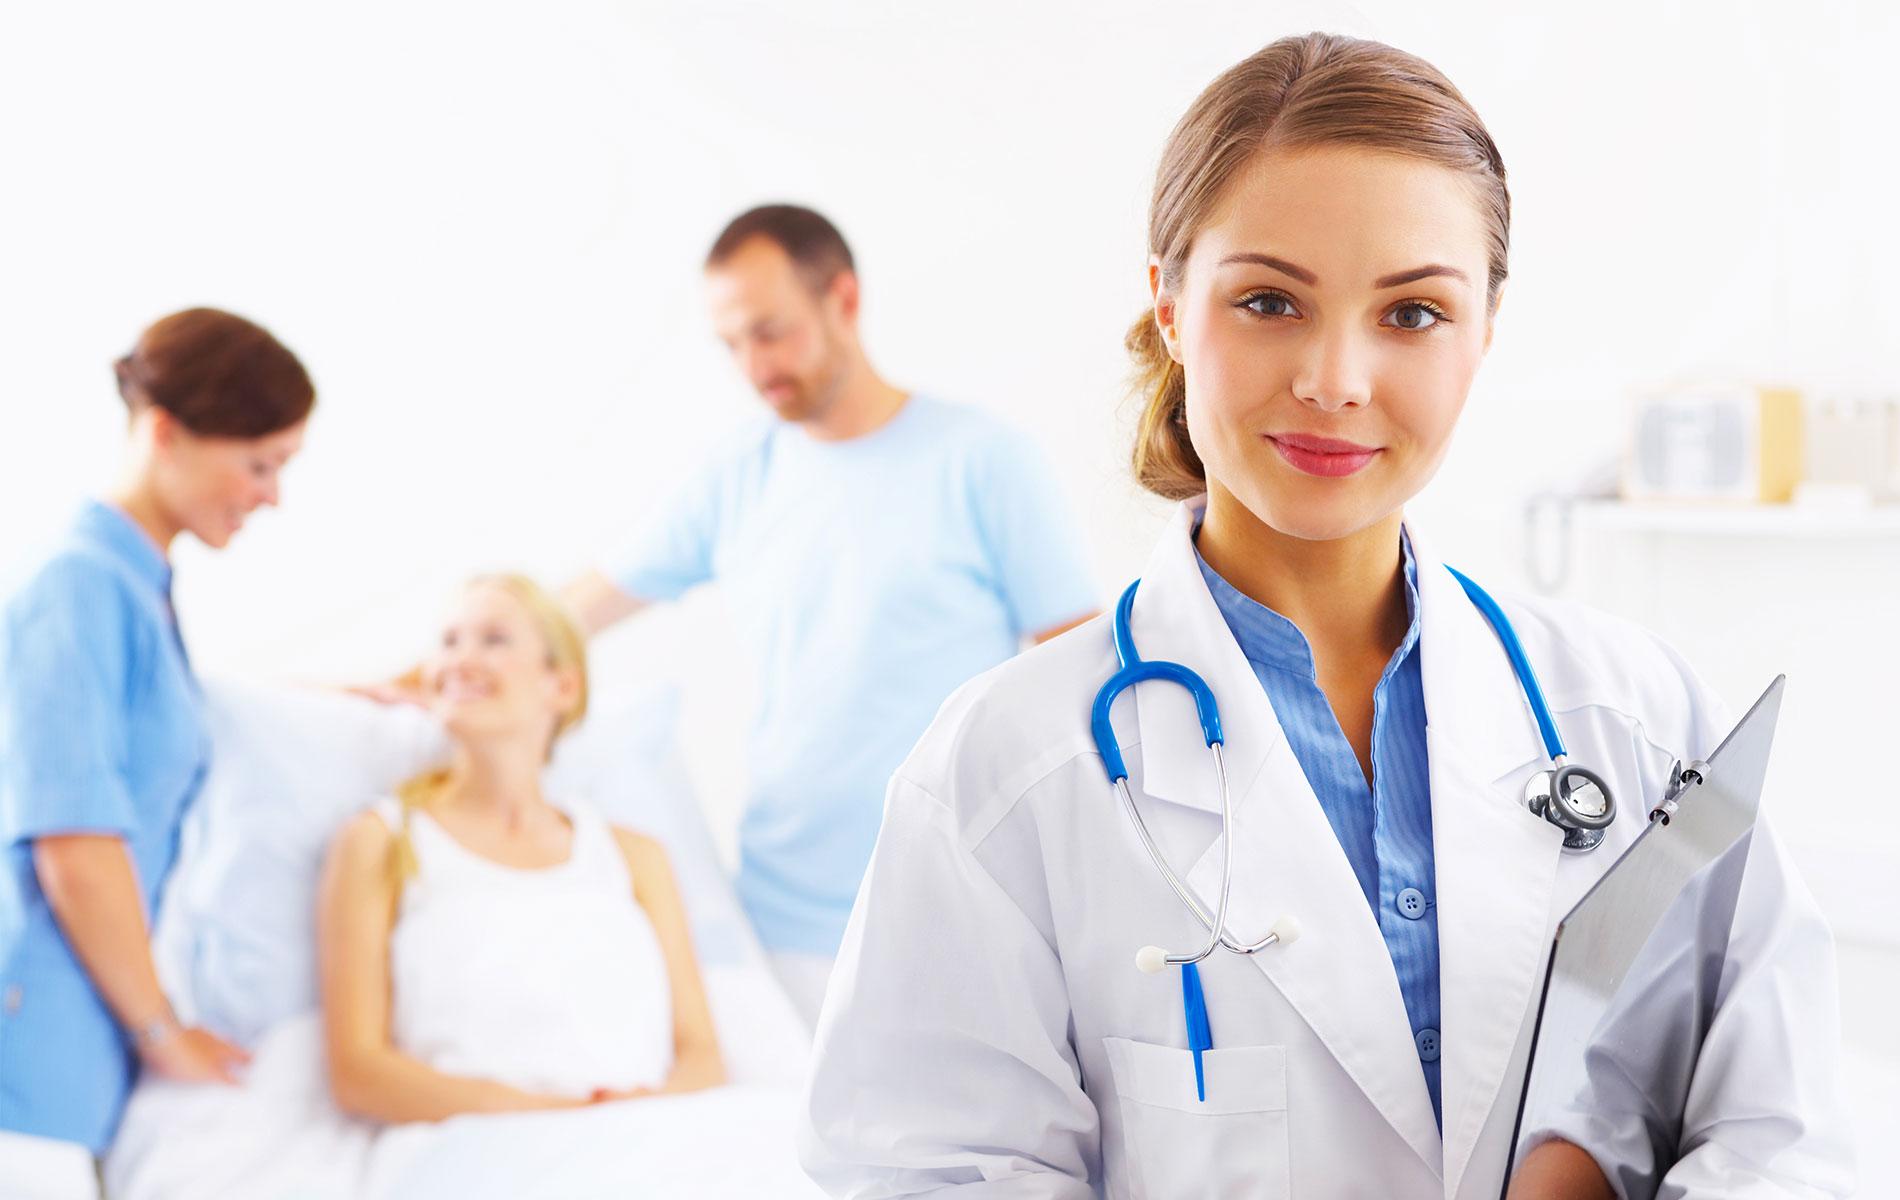 Medizintechnik & Life Science - EBM